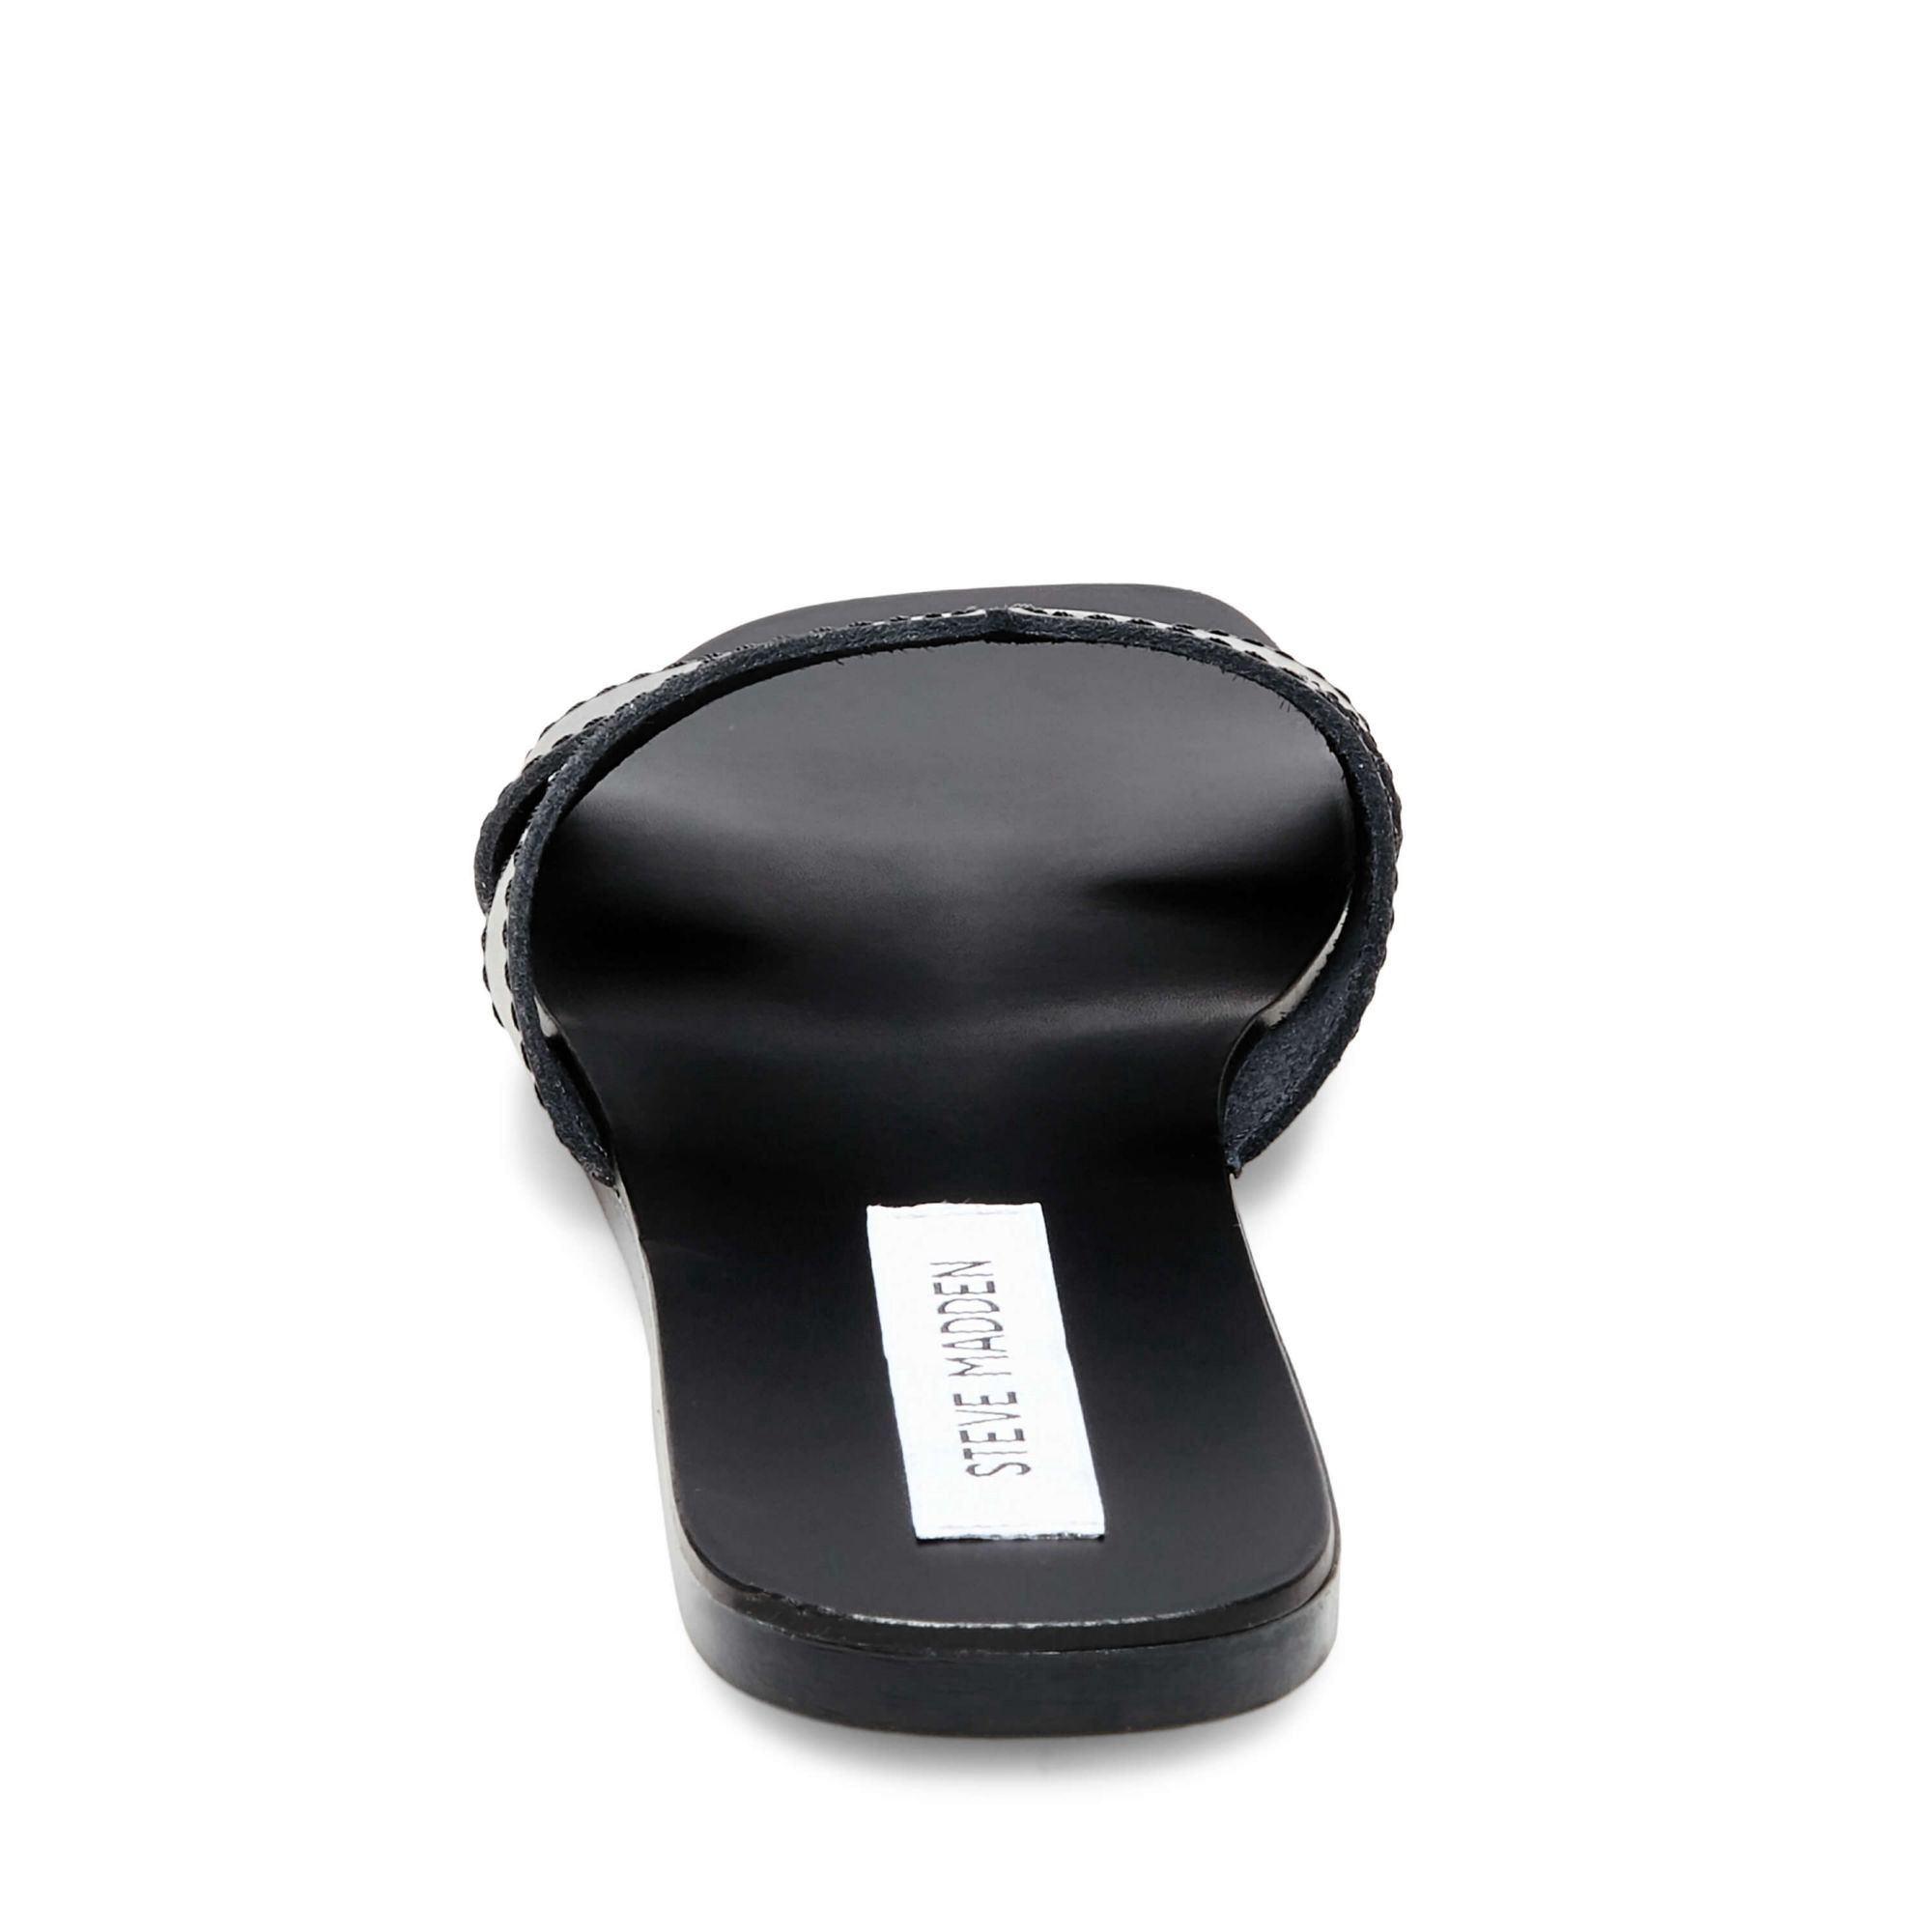 b02d10b94a0 Steve Madden Sayler - Coral Leather 10.0 Steve Madden